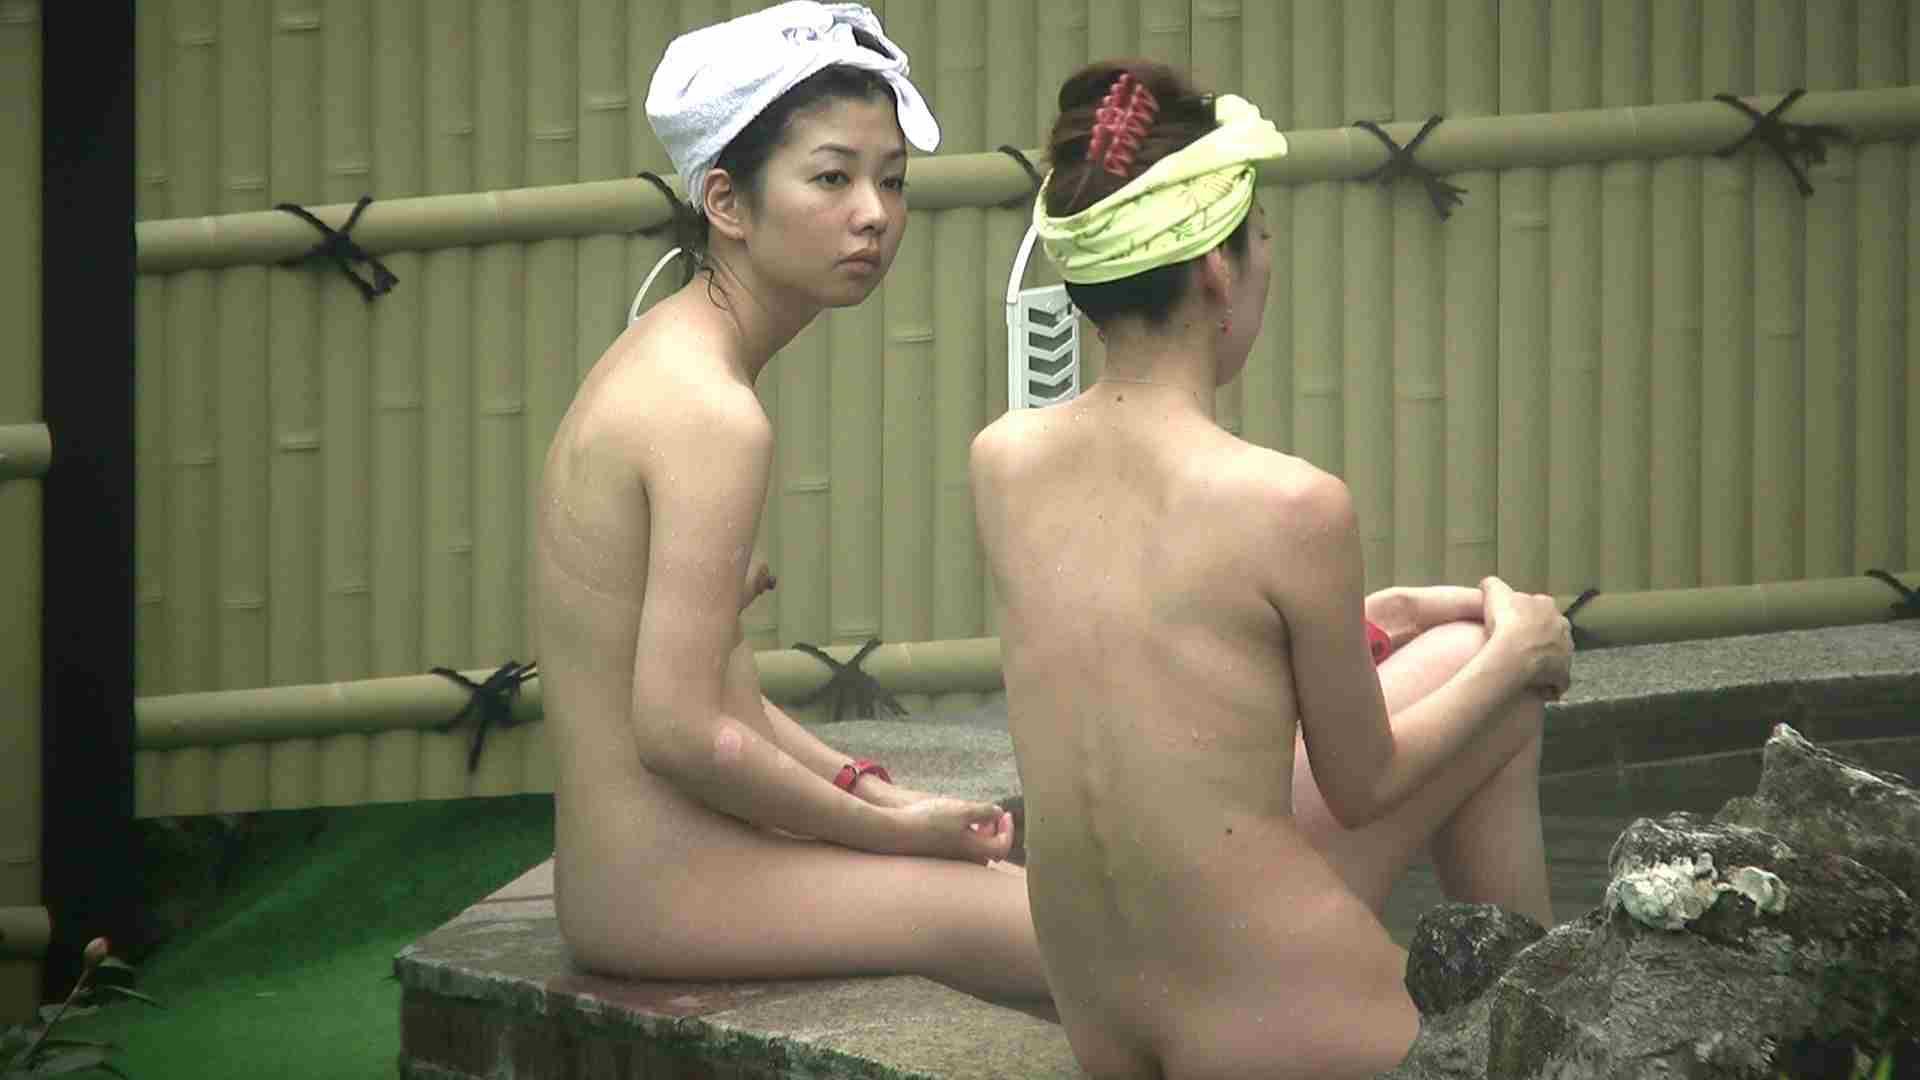 Aquaな露天風呂Vol.192 露天風呂 | OLのエロ生活  79連発 46